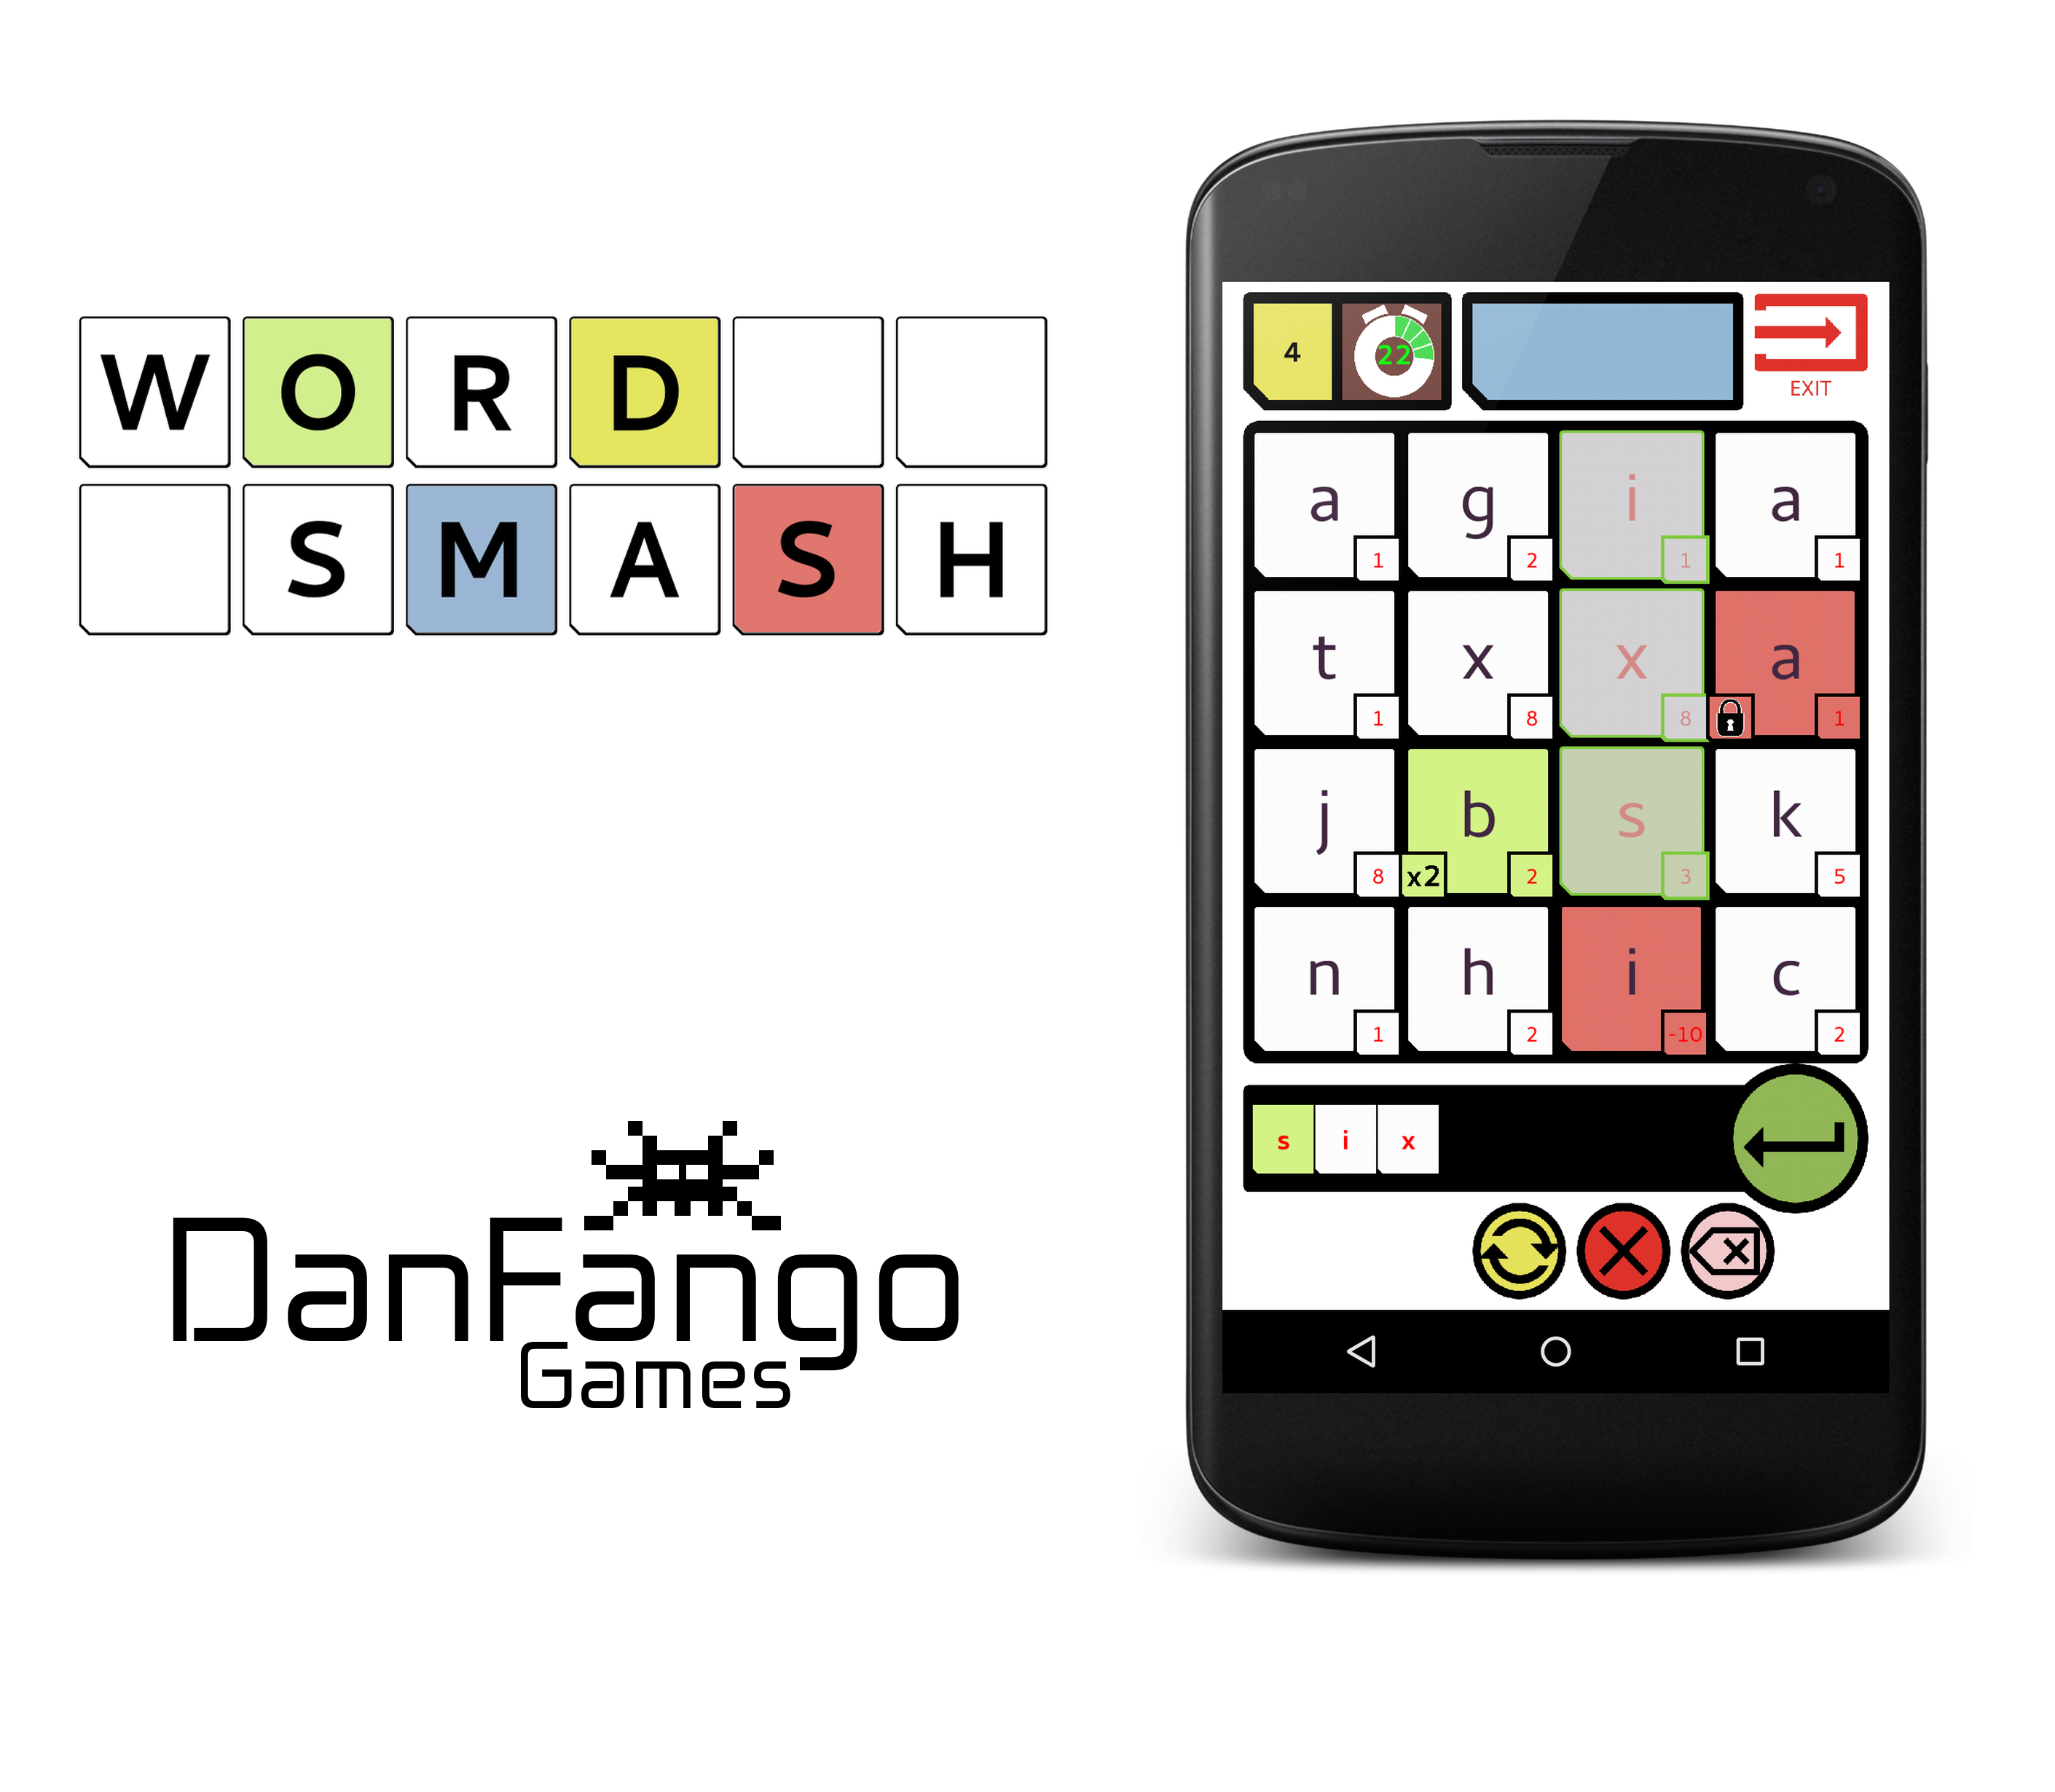 WordSmash